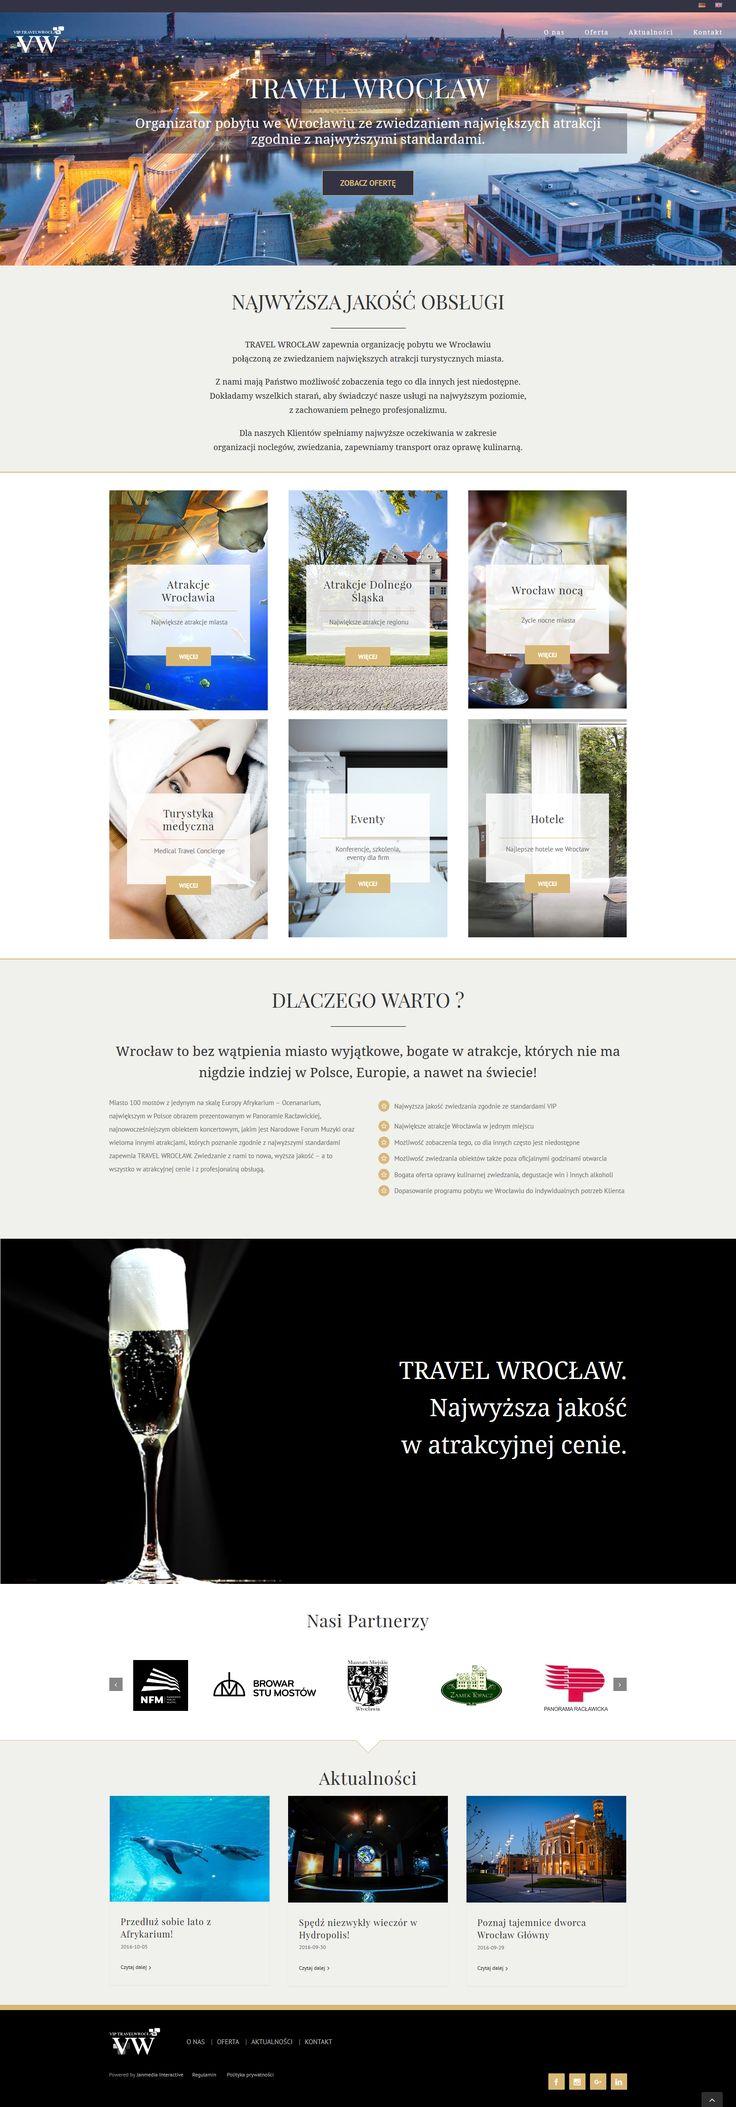 #web #webdesign #wordpress #website #design #layout